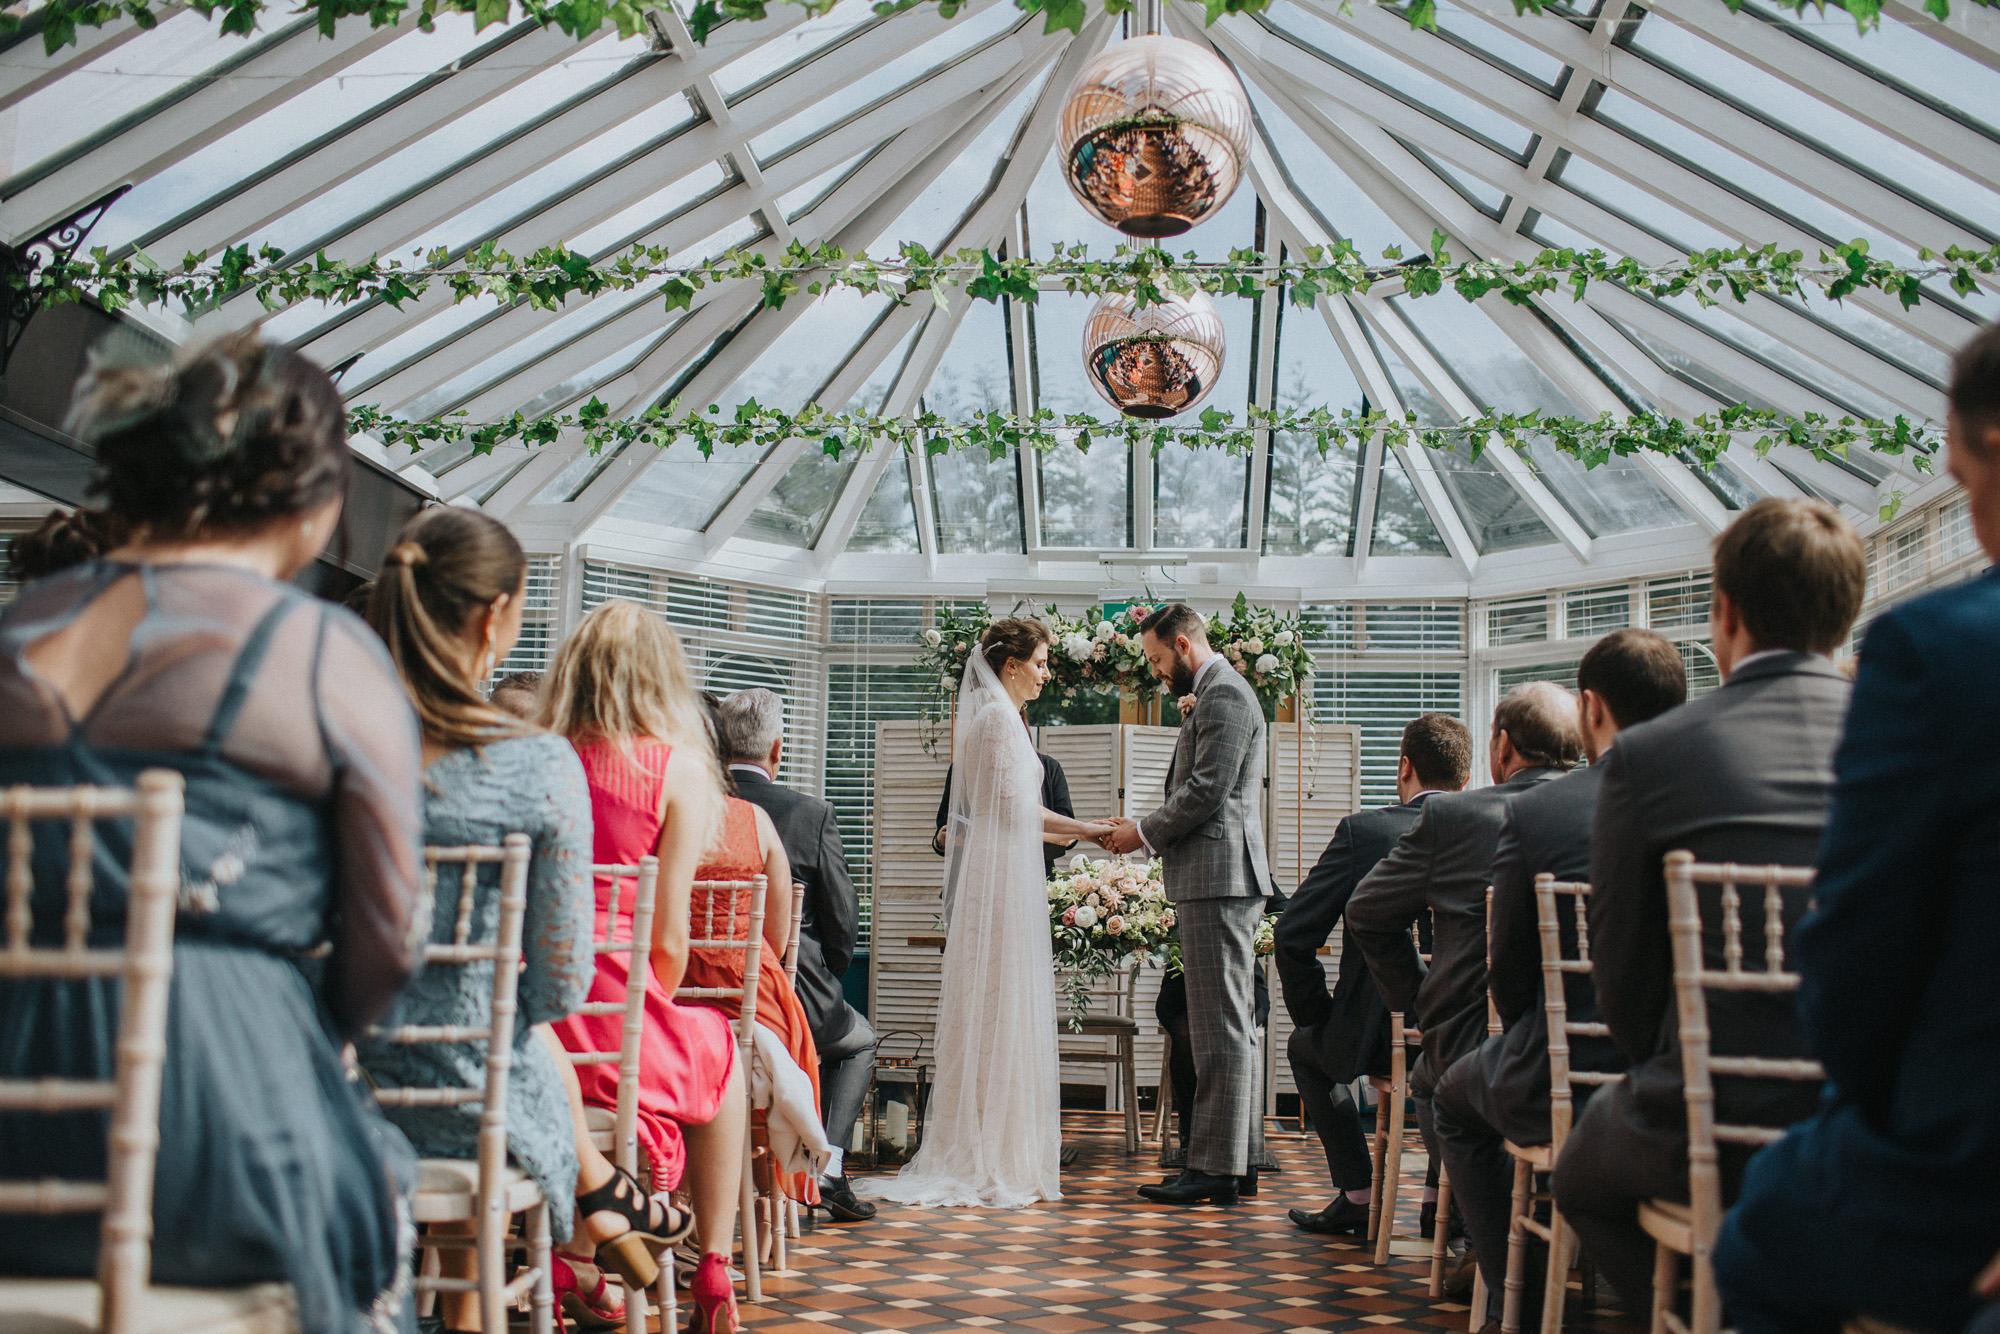 Kate-Beaumont-Lace-Flared-Dahlia-Gown-Leeds-Wedding-Bloom-Weddings-18.jpg